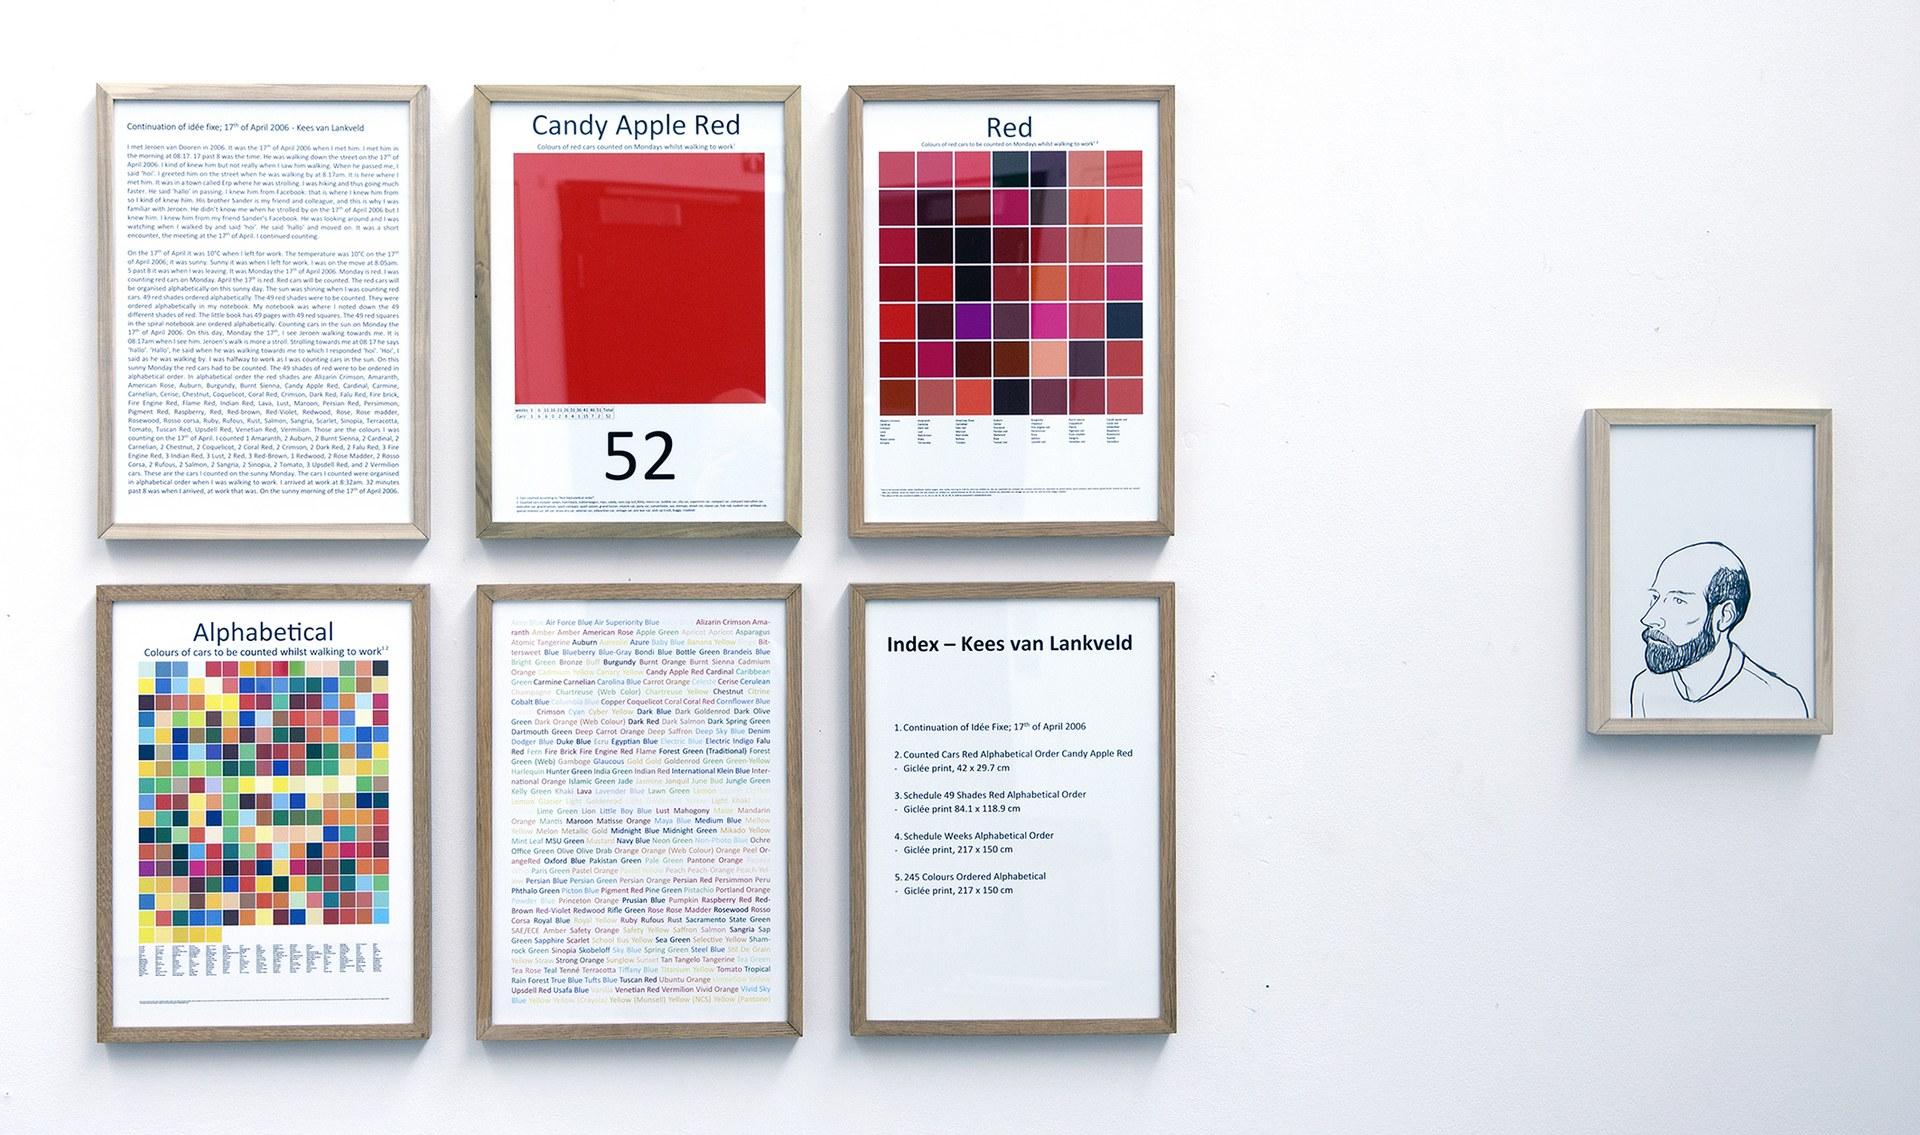 Kees van Lankveld, Alphabetical Order Information